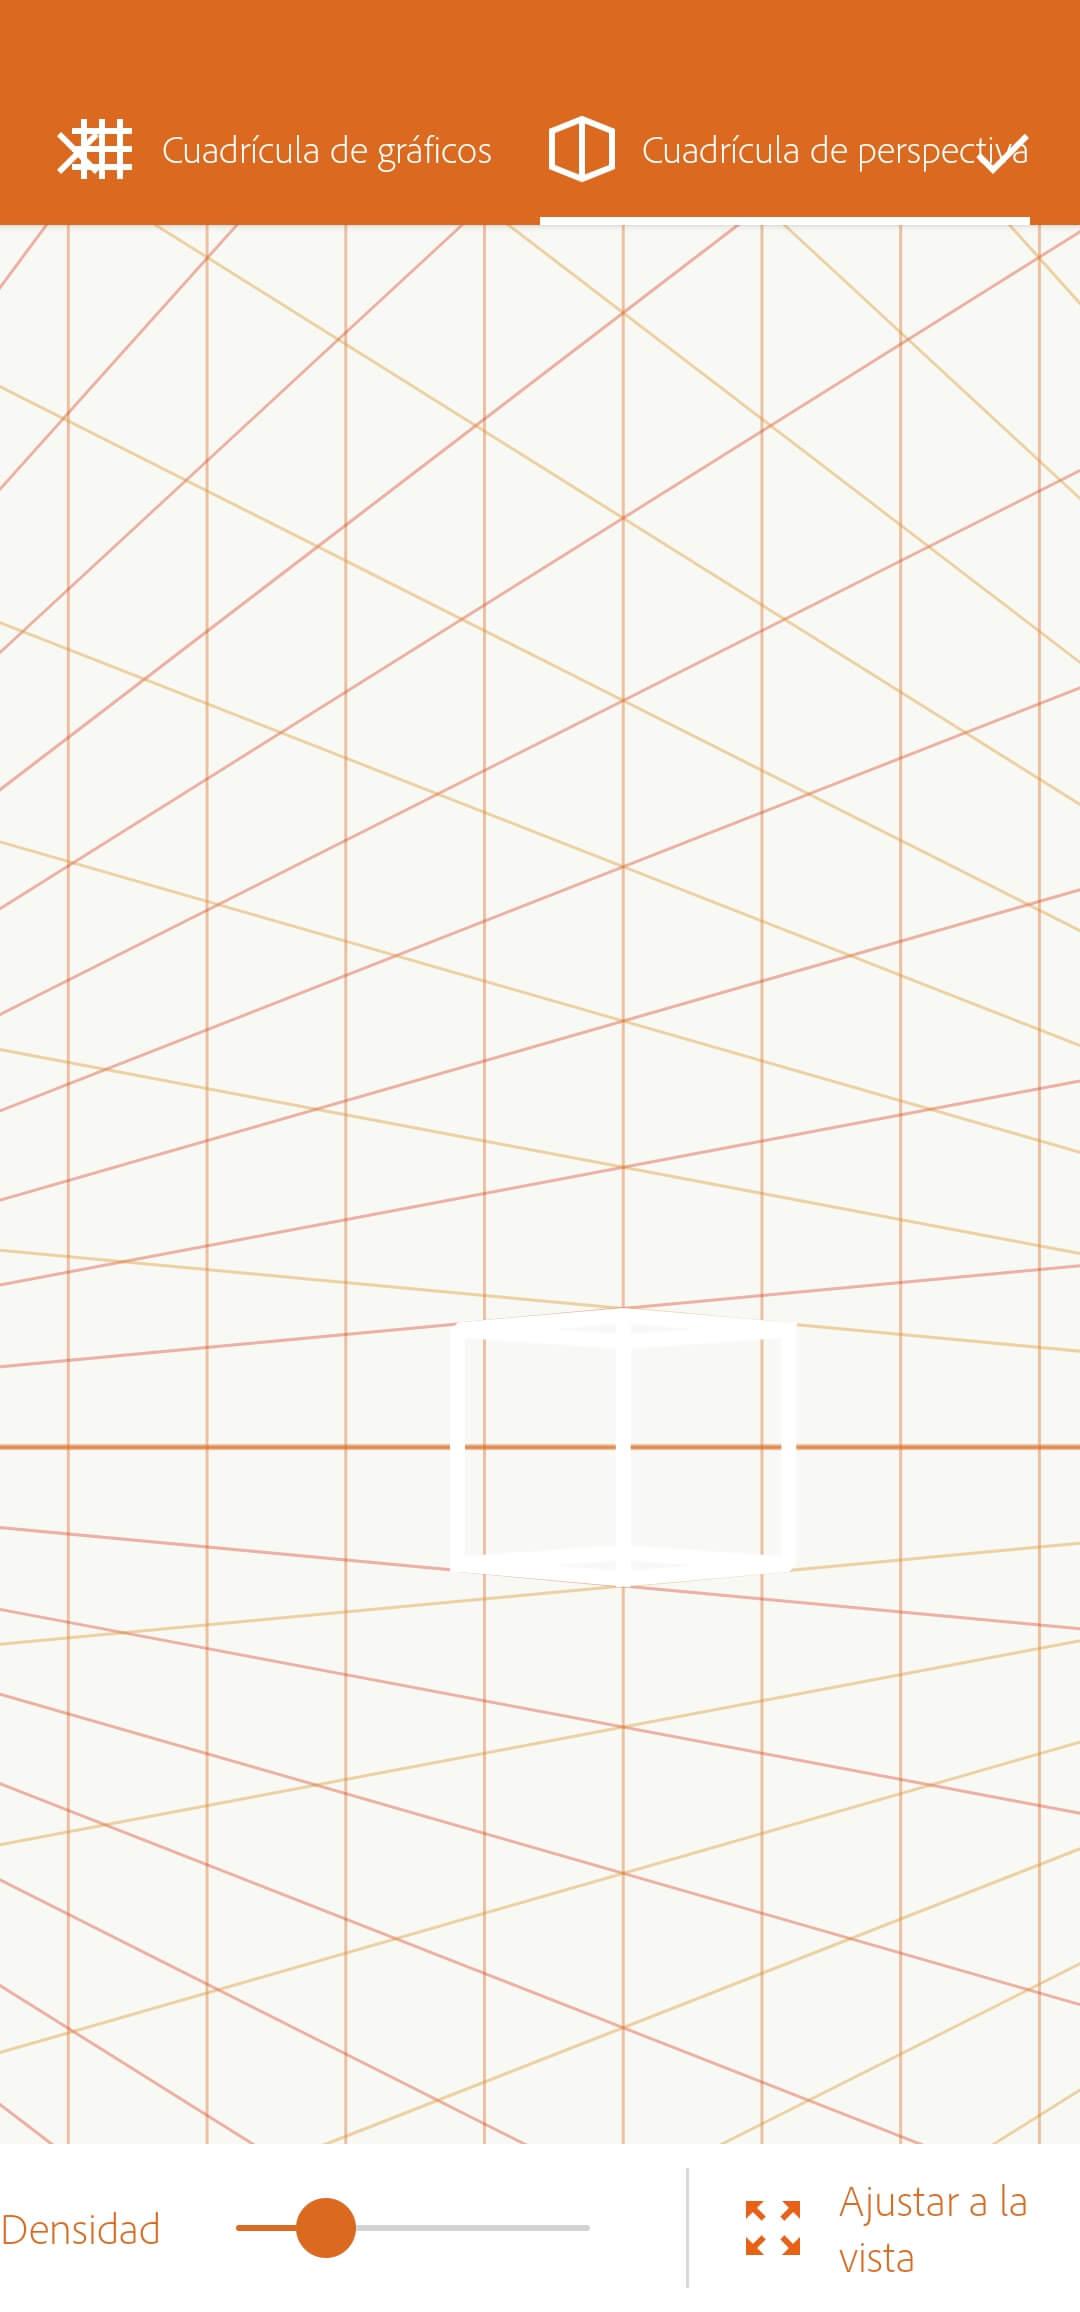 quadrícula perspectiva - adobe draw